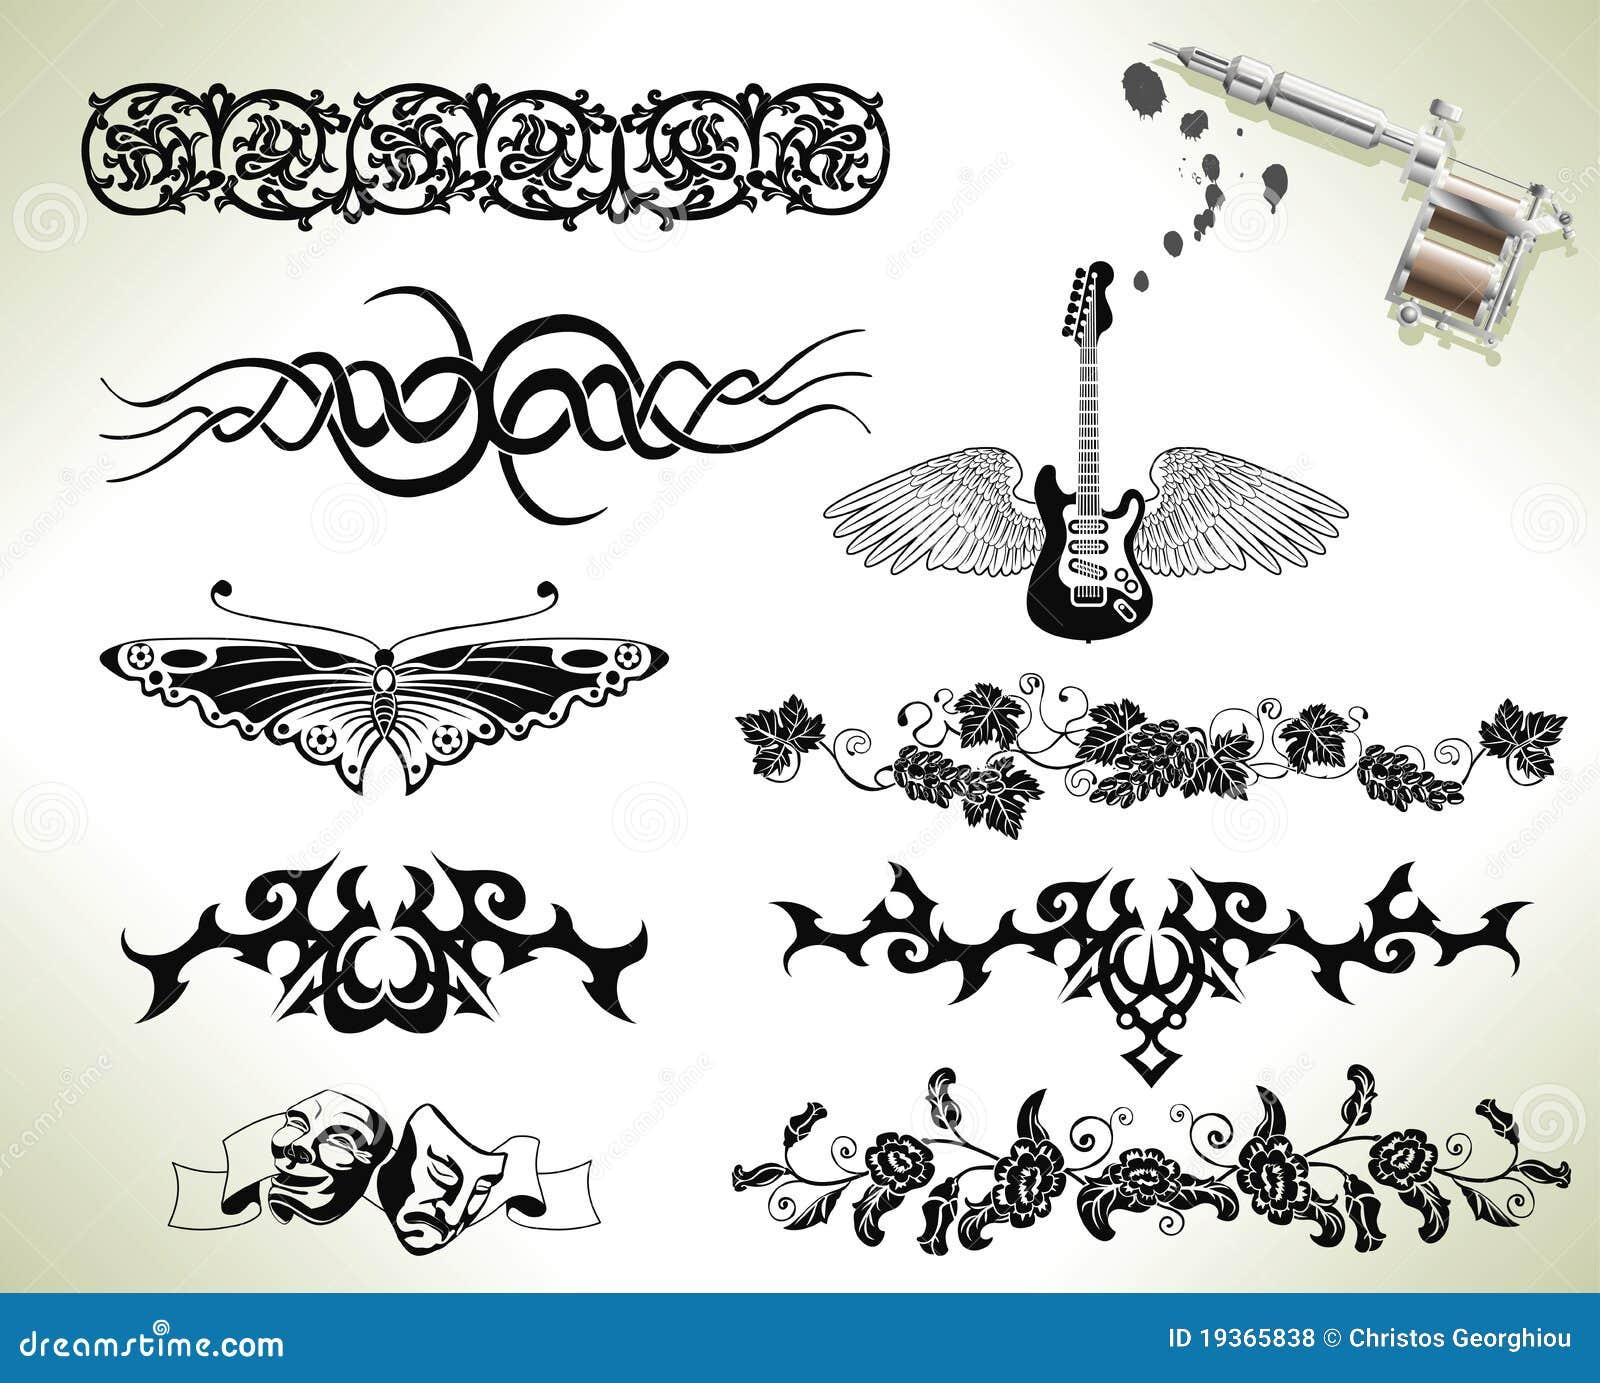 tattoo flash design elements royalty free stock photos image 19365838. Black Bedroom Furniture Sets. Home Design Ideas